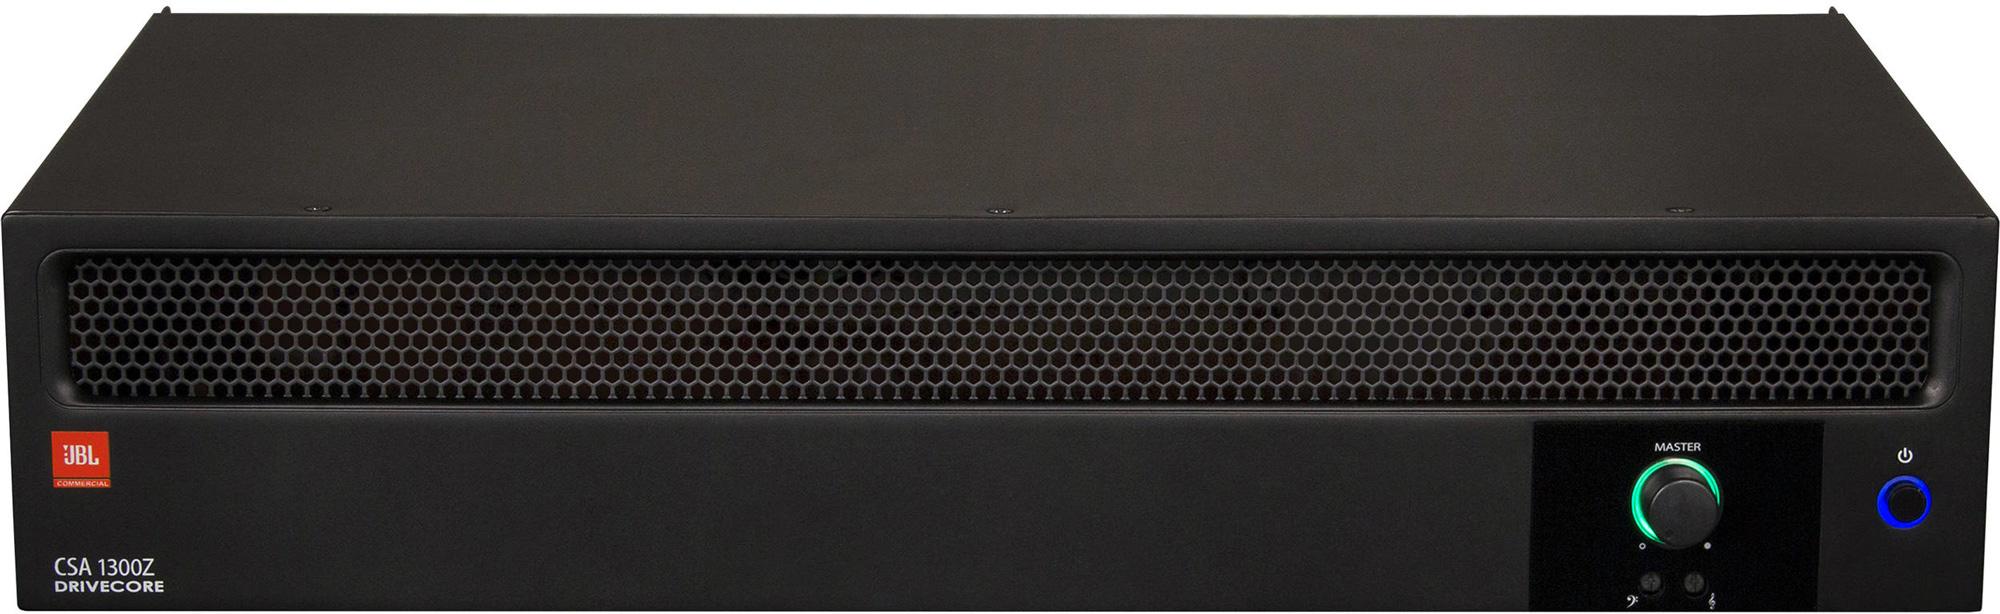 Jbl Csa1300z Csa 1300z Single Channel 300w Audio Power